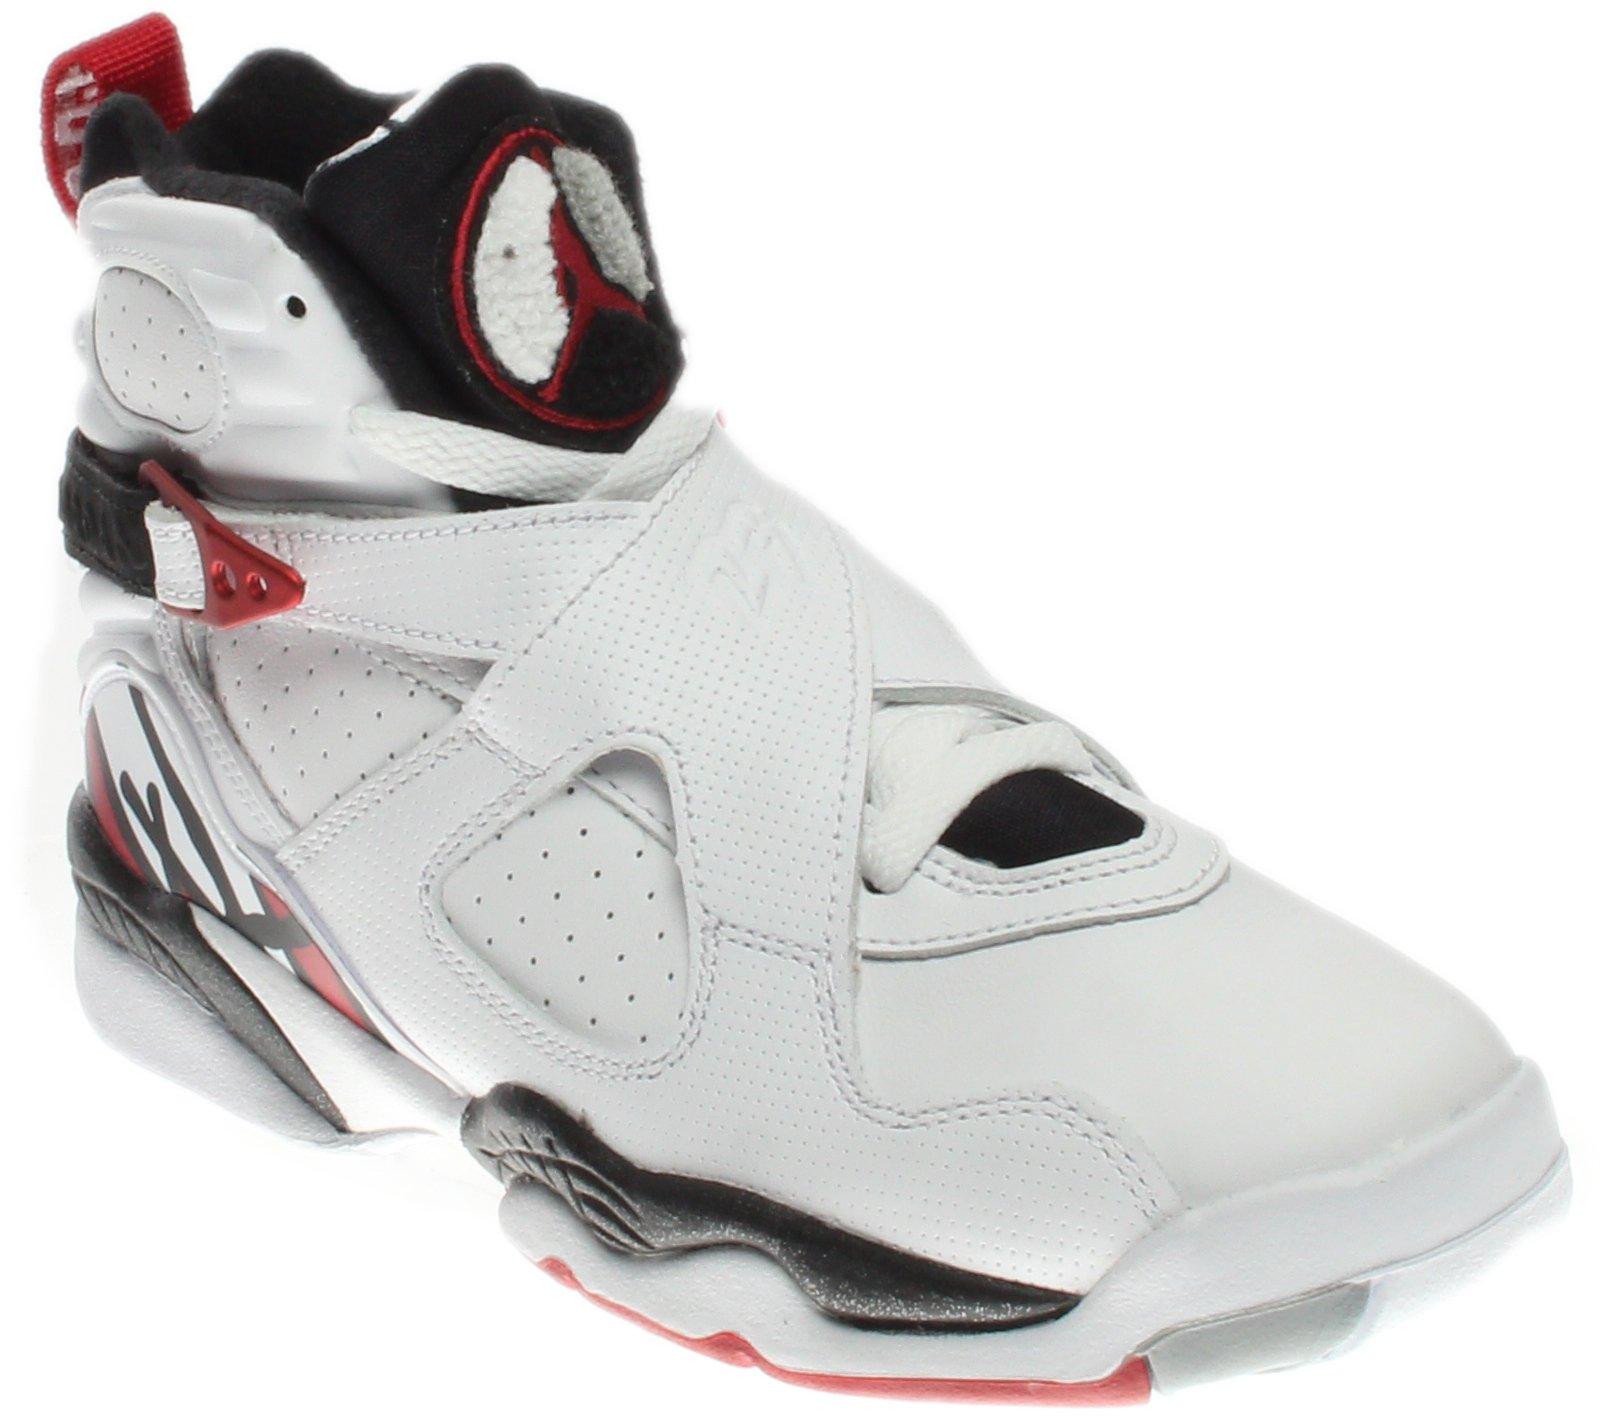 37 Bambino 8 Gym Grey Pelle Black Jordan Eu Alte Sneakers PERSxwtq